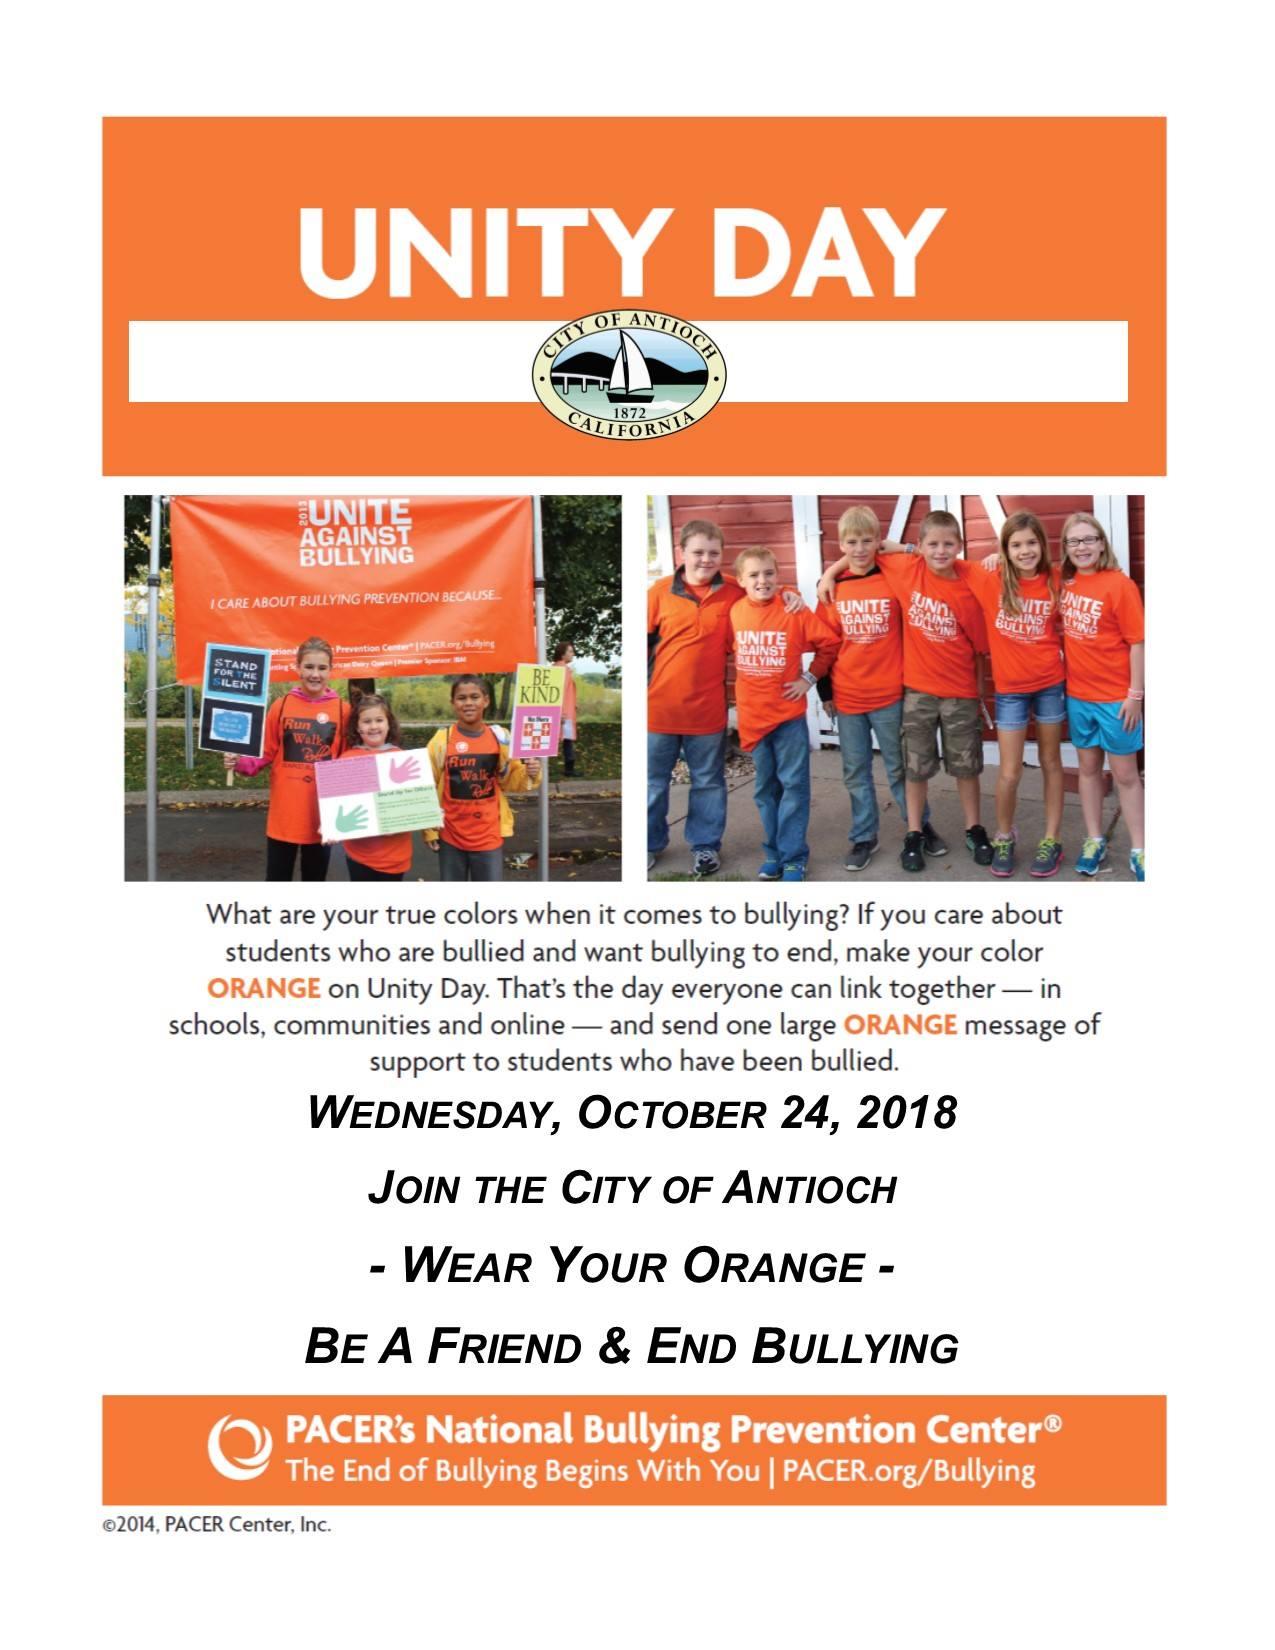 Unity Day Antioch